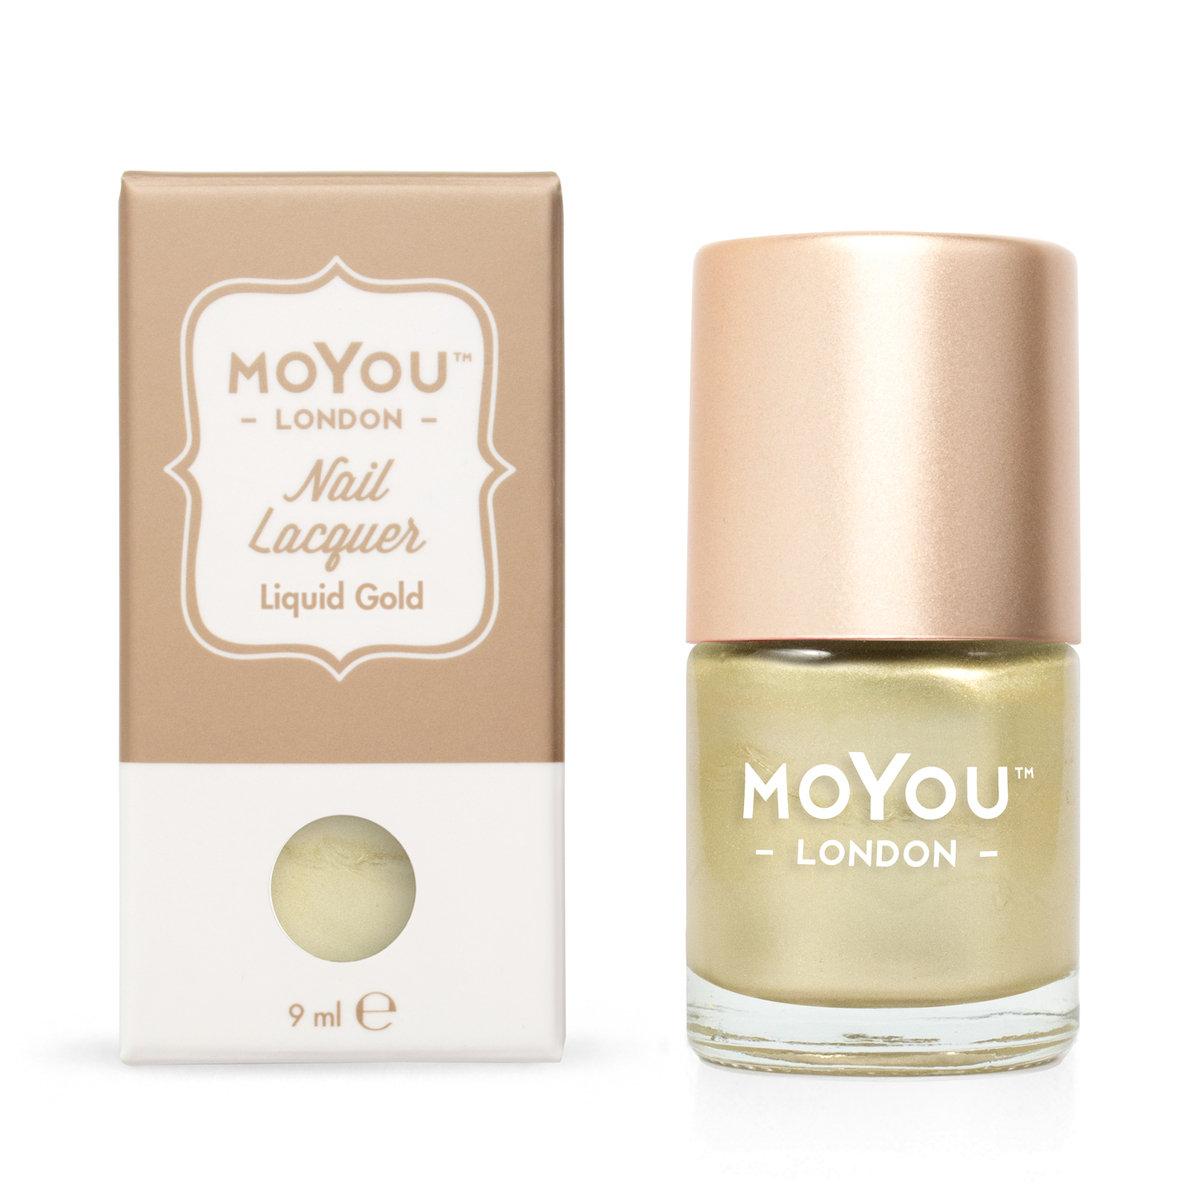 快乾指甲油 - Liquid Gold #53